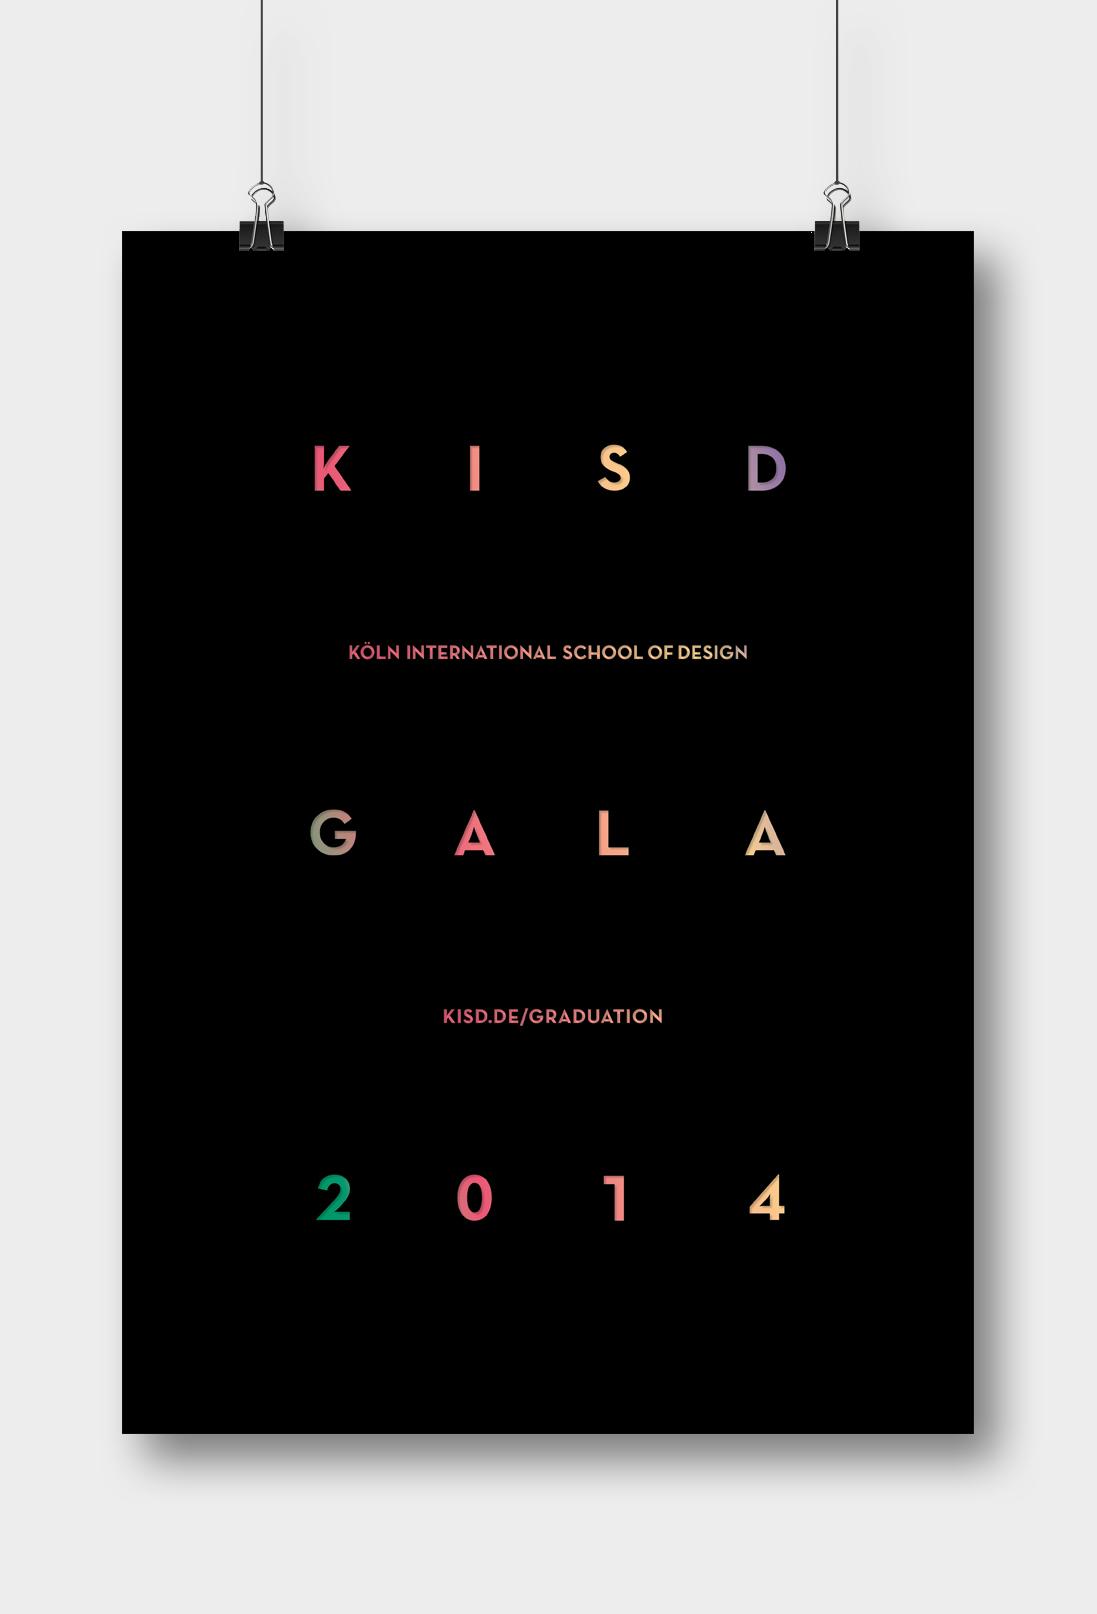 KISD Gala 2014